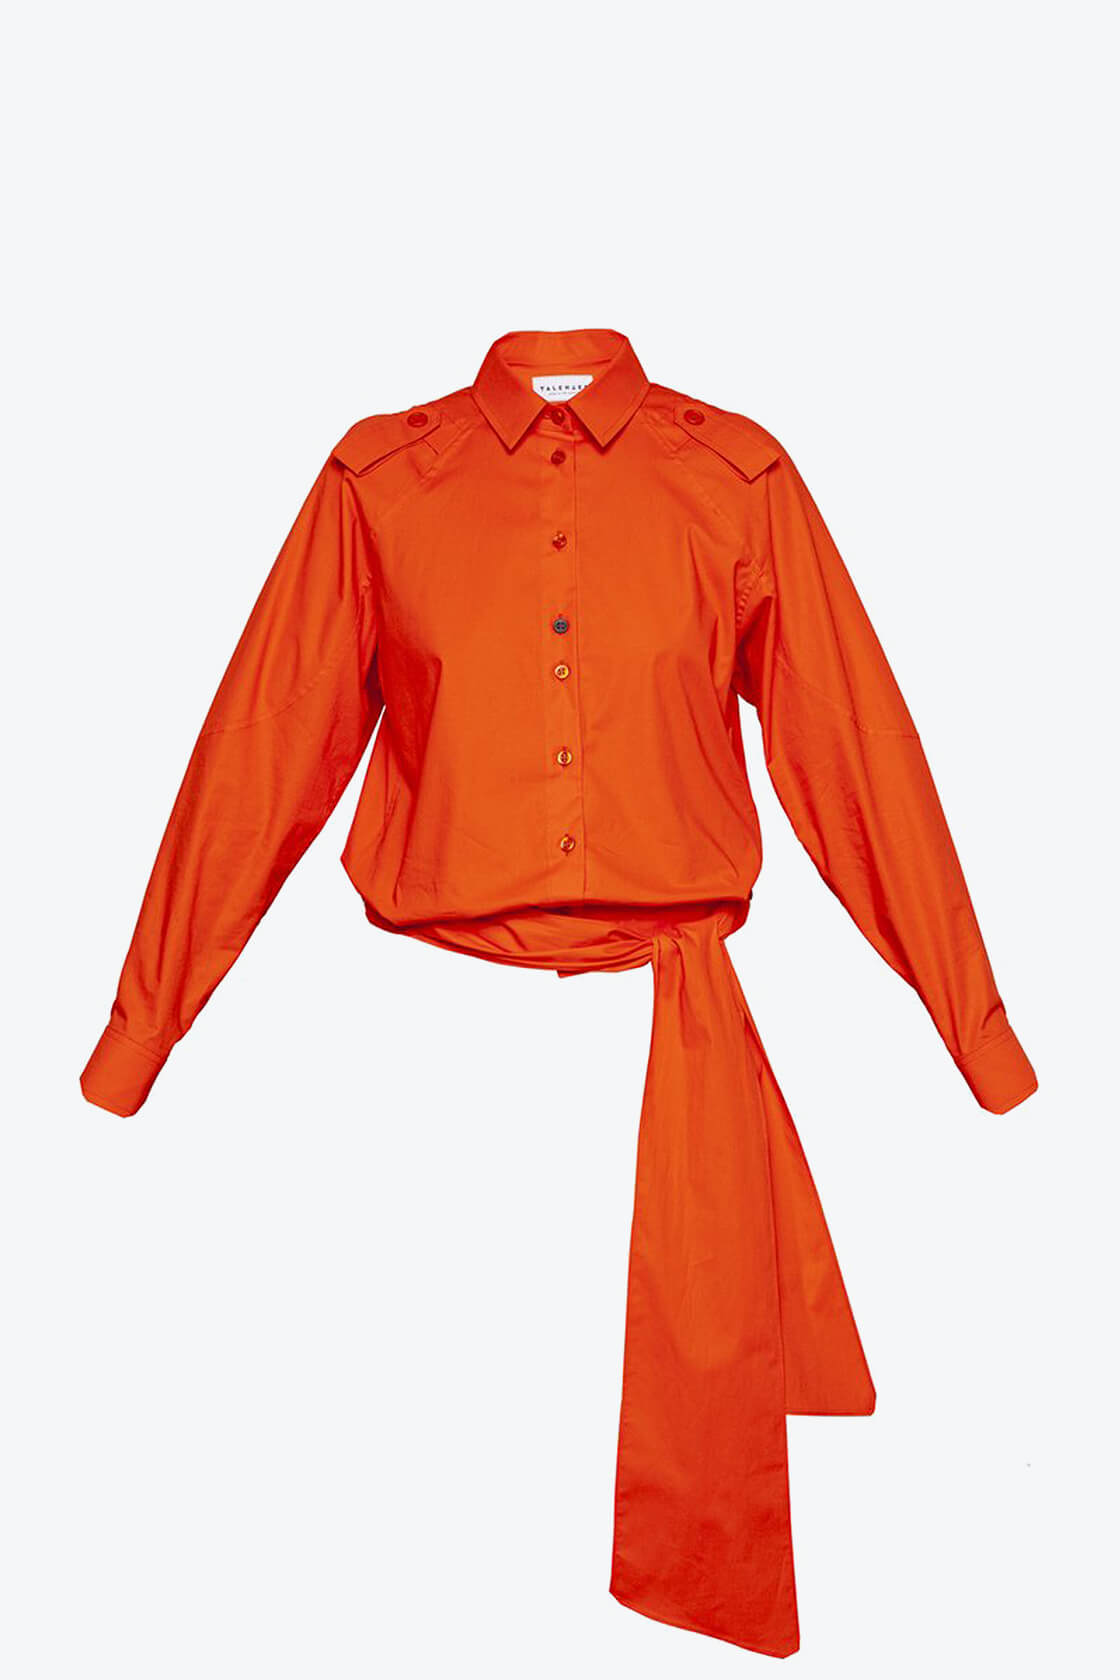 OL10000189 Low waist blouse orange1